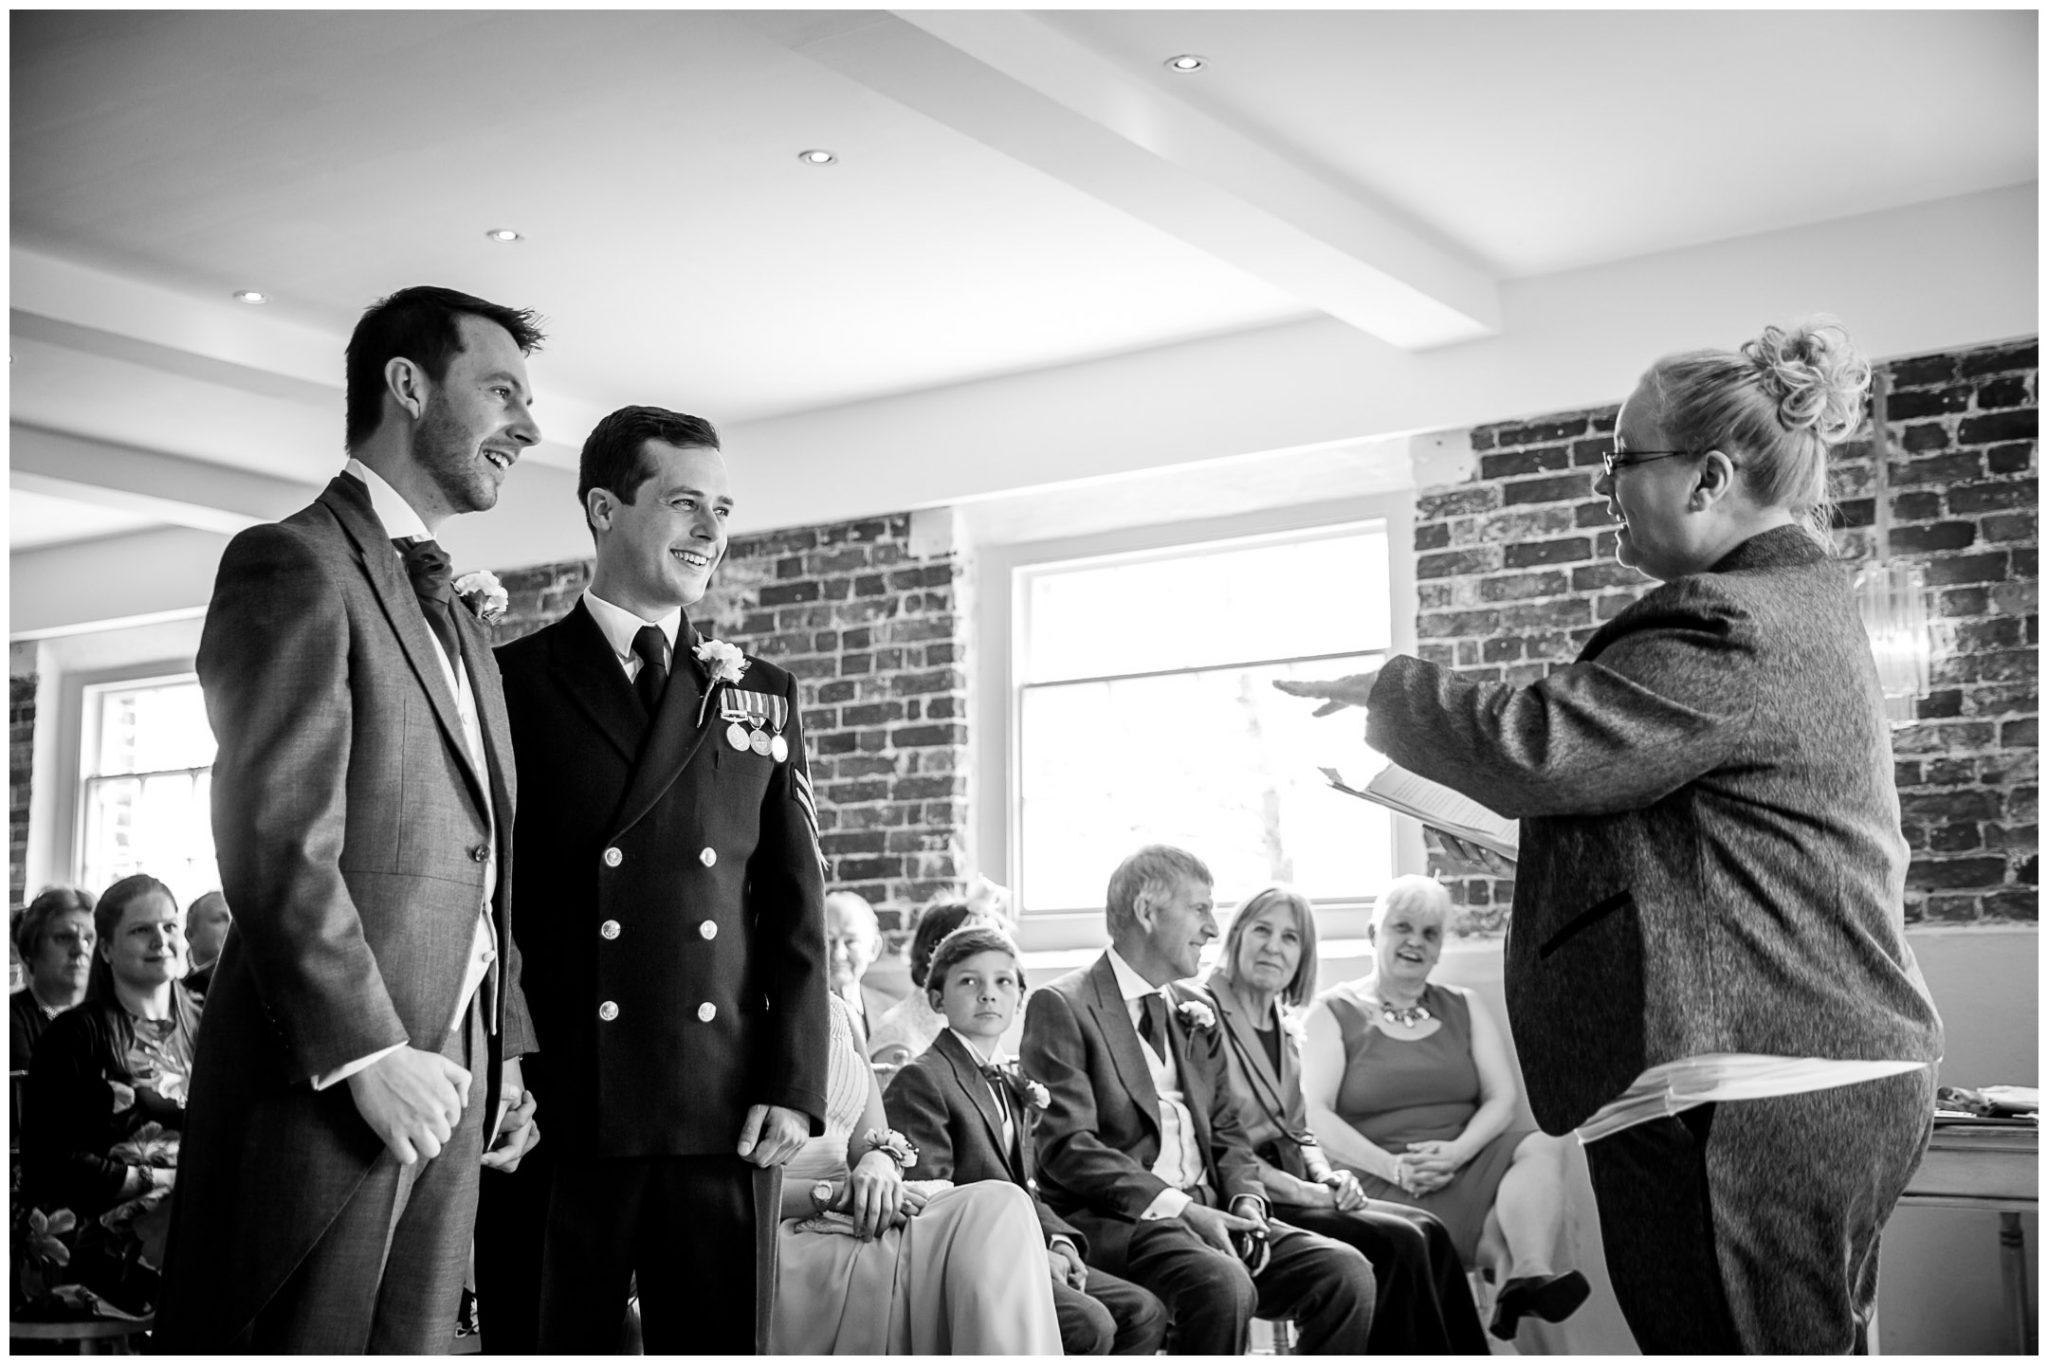 Sopley wedding photographer registrar leads ceremony